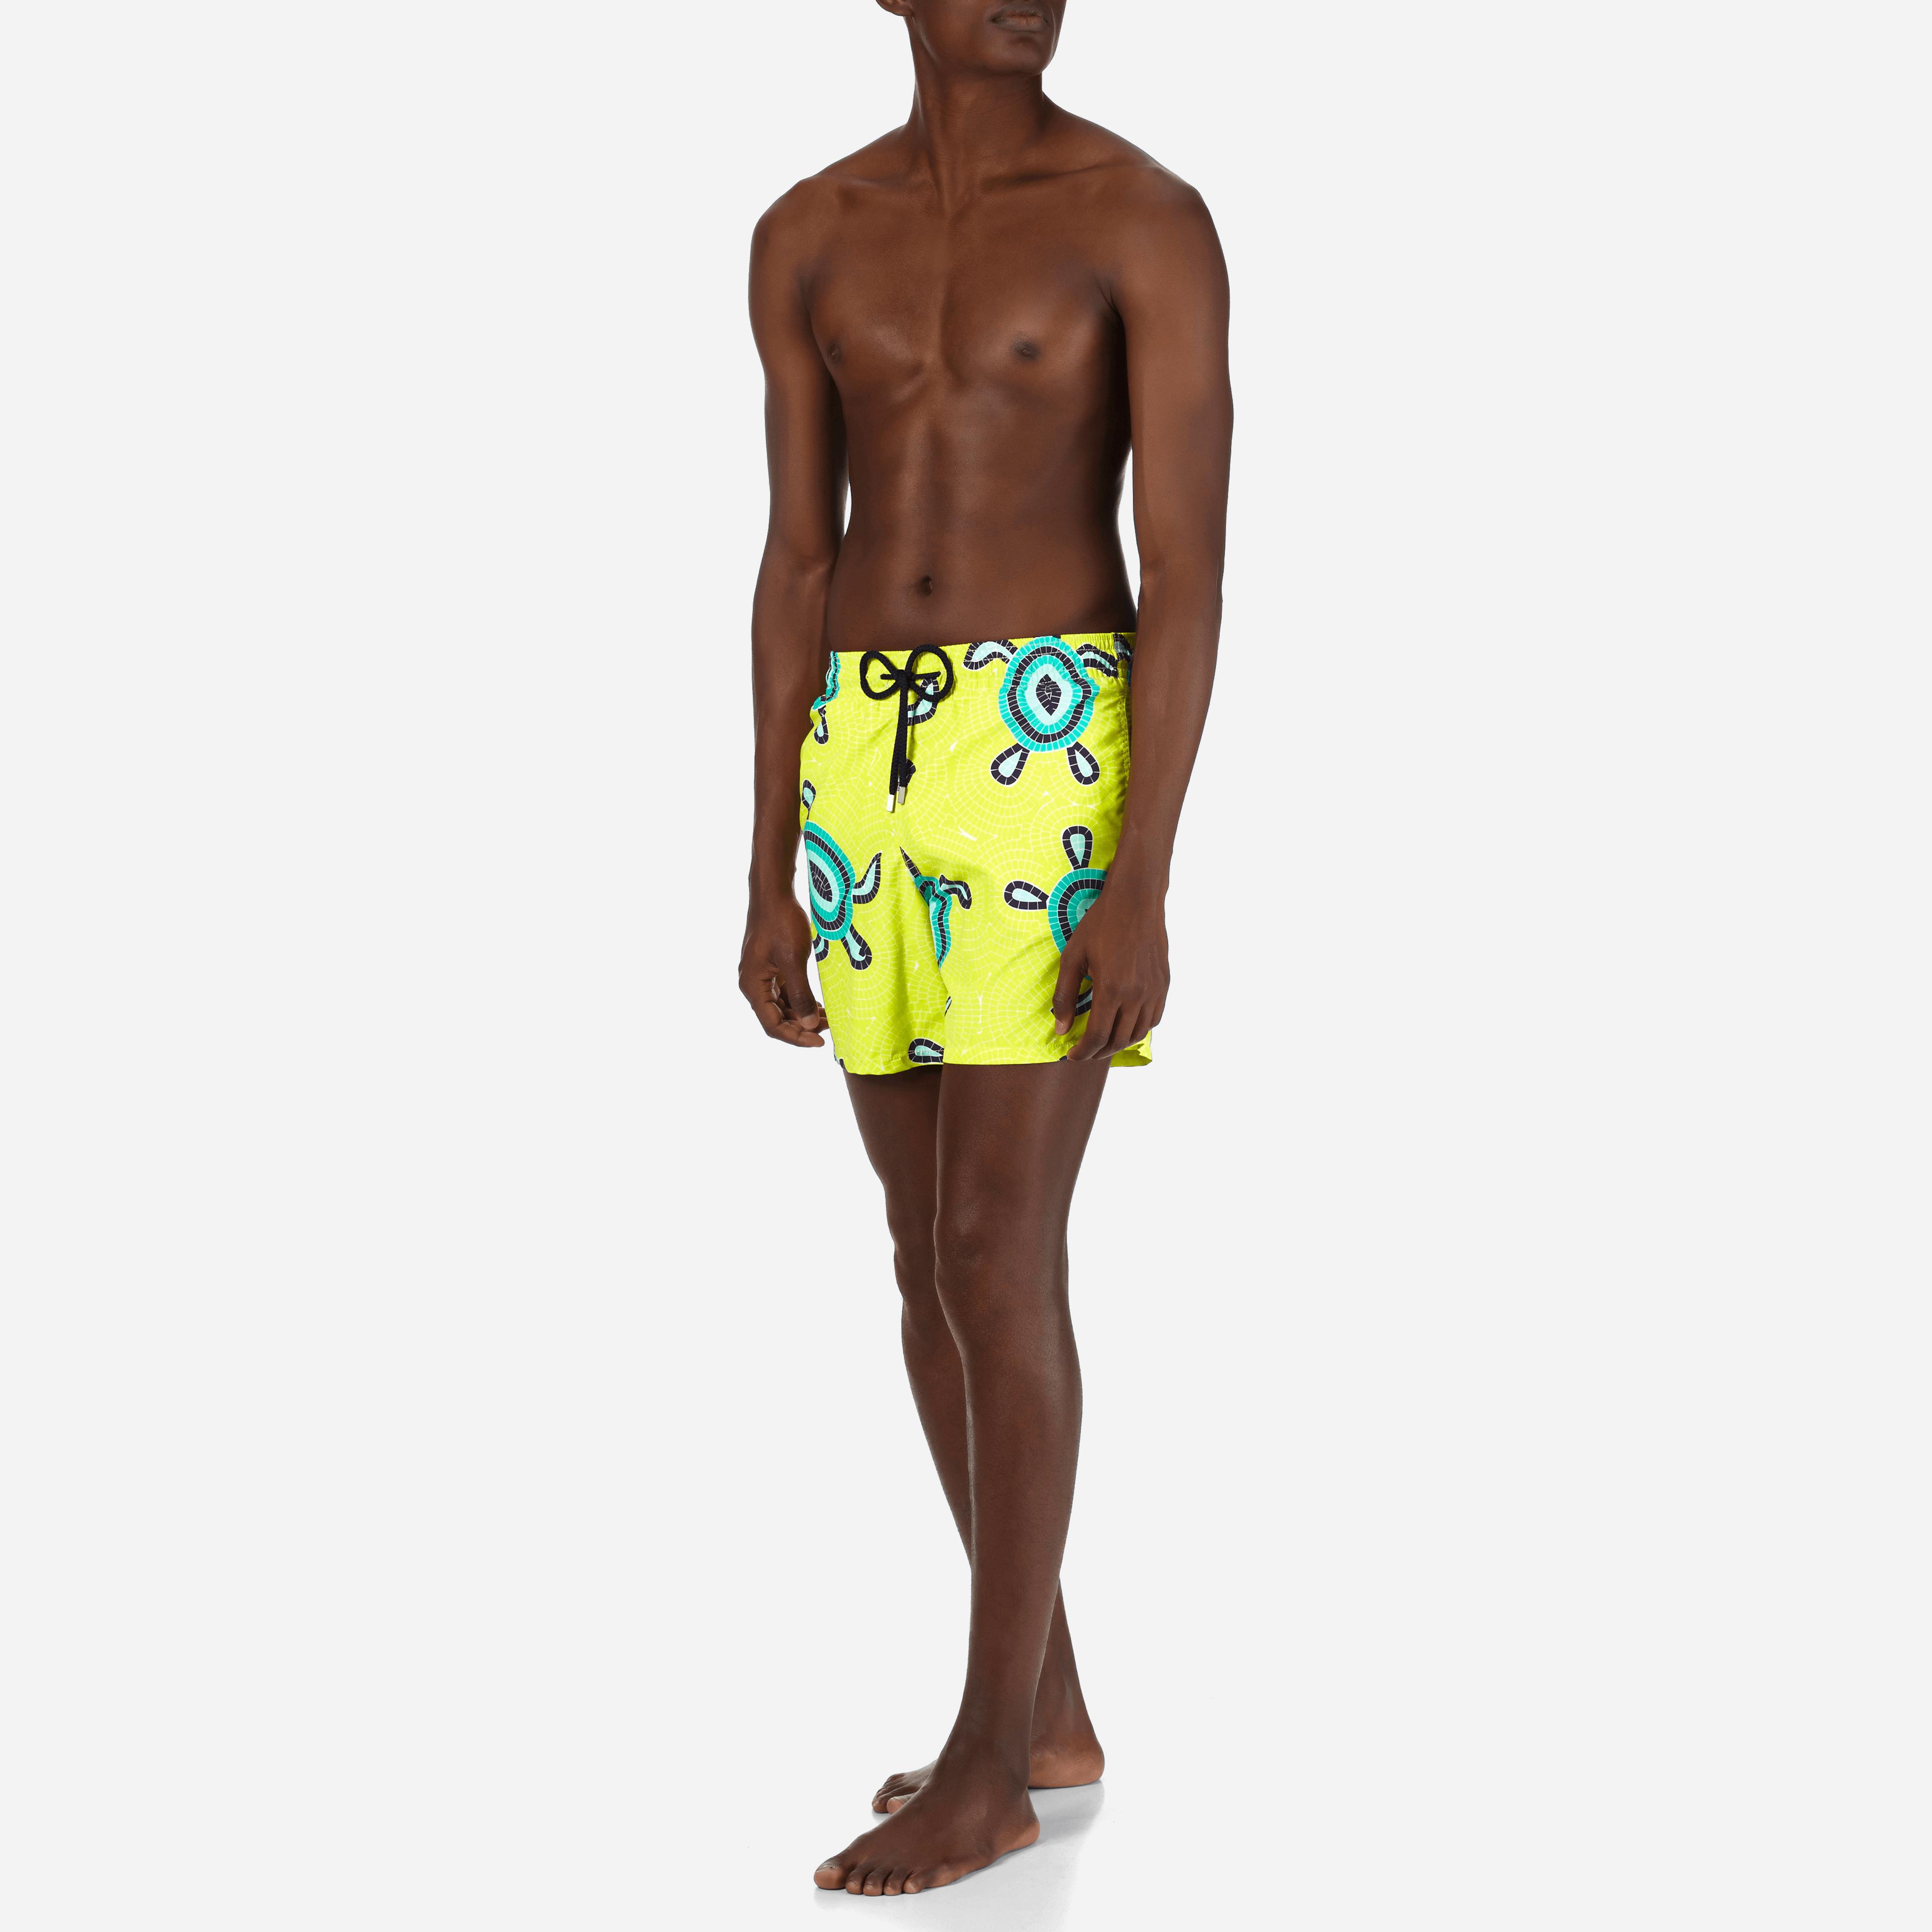 483c2ce6af5 Men Swimwear - Men Swimwear Mosaic Turtles - SWIMMING TRUNK - MOOREA -  Green - XS - Vilebrequin